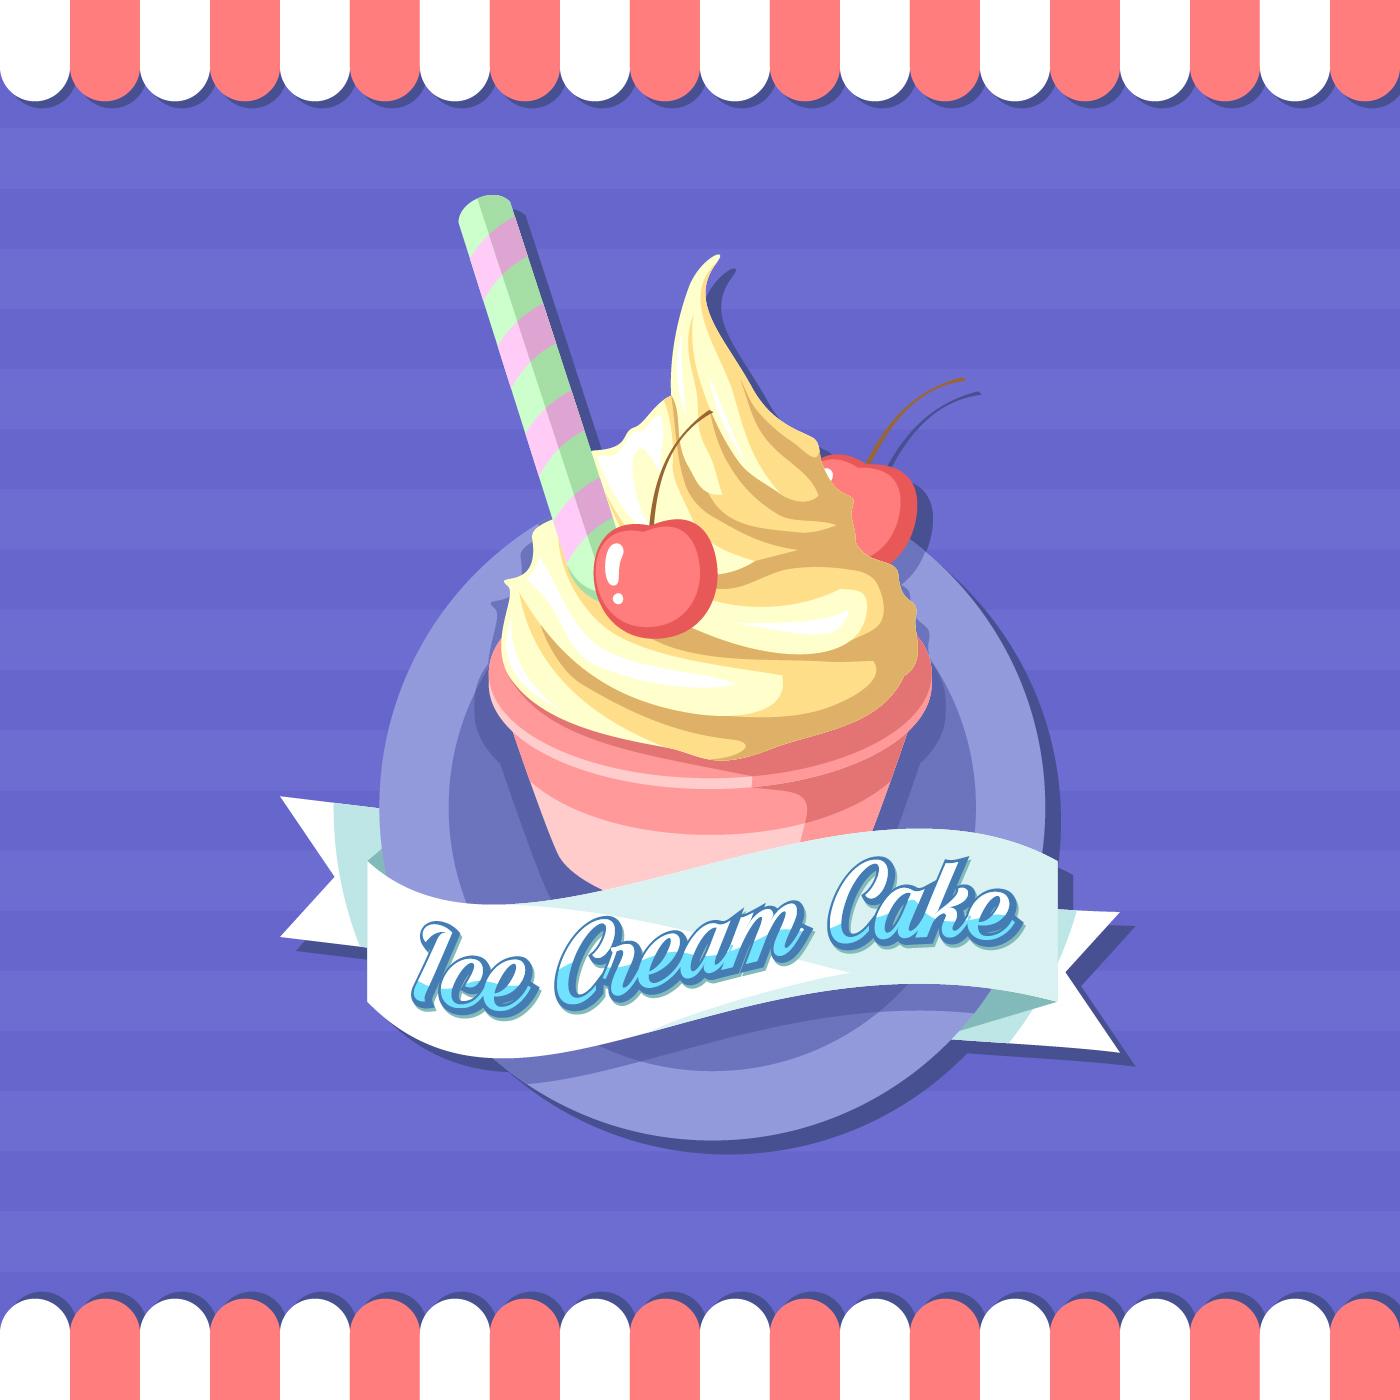 Ice Cream Free Vector Download 980 Free Vector For: Ice Cream Cup Shop Logo Vector